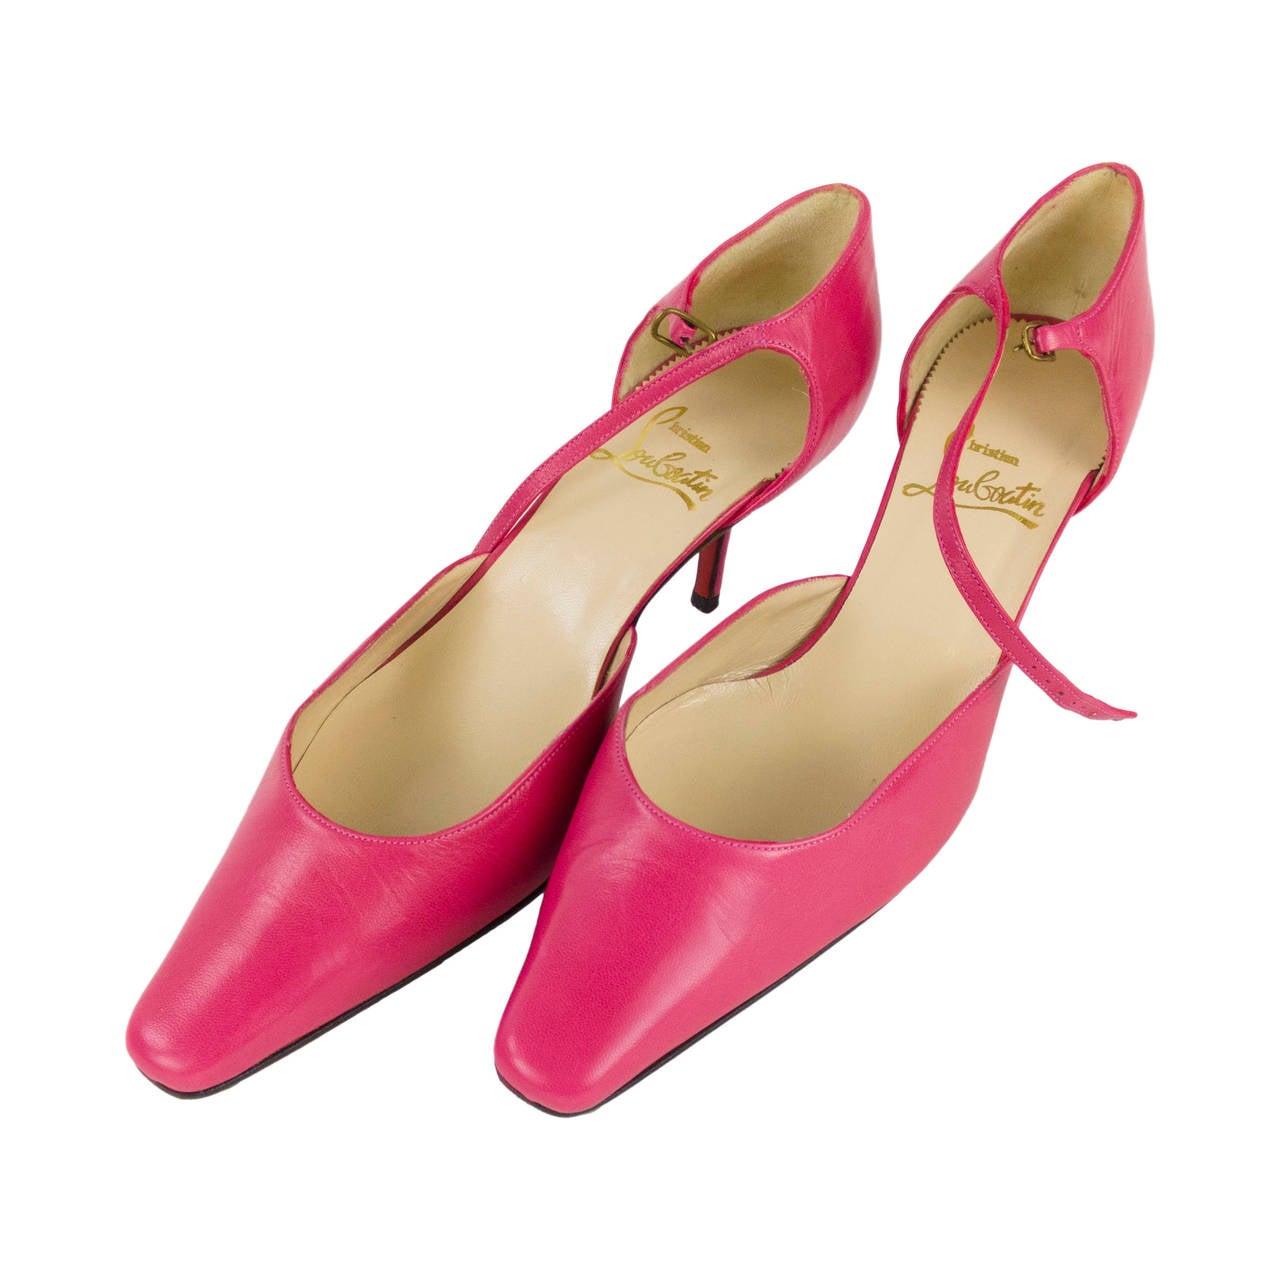 christian louboatin pointy toe leather pink shoes size